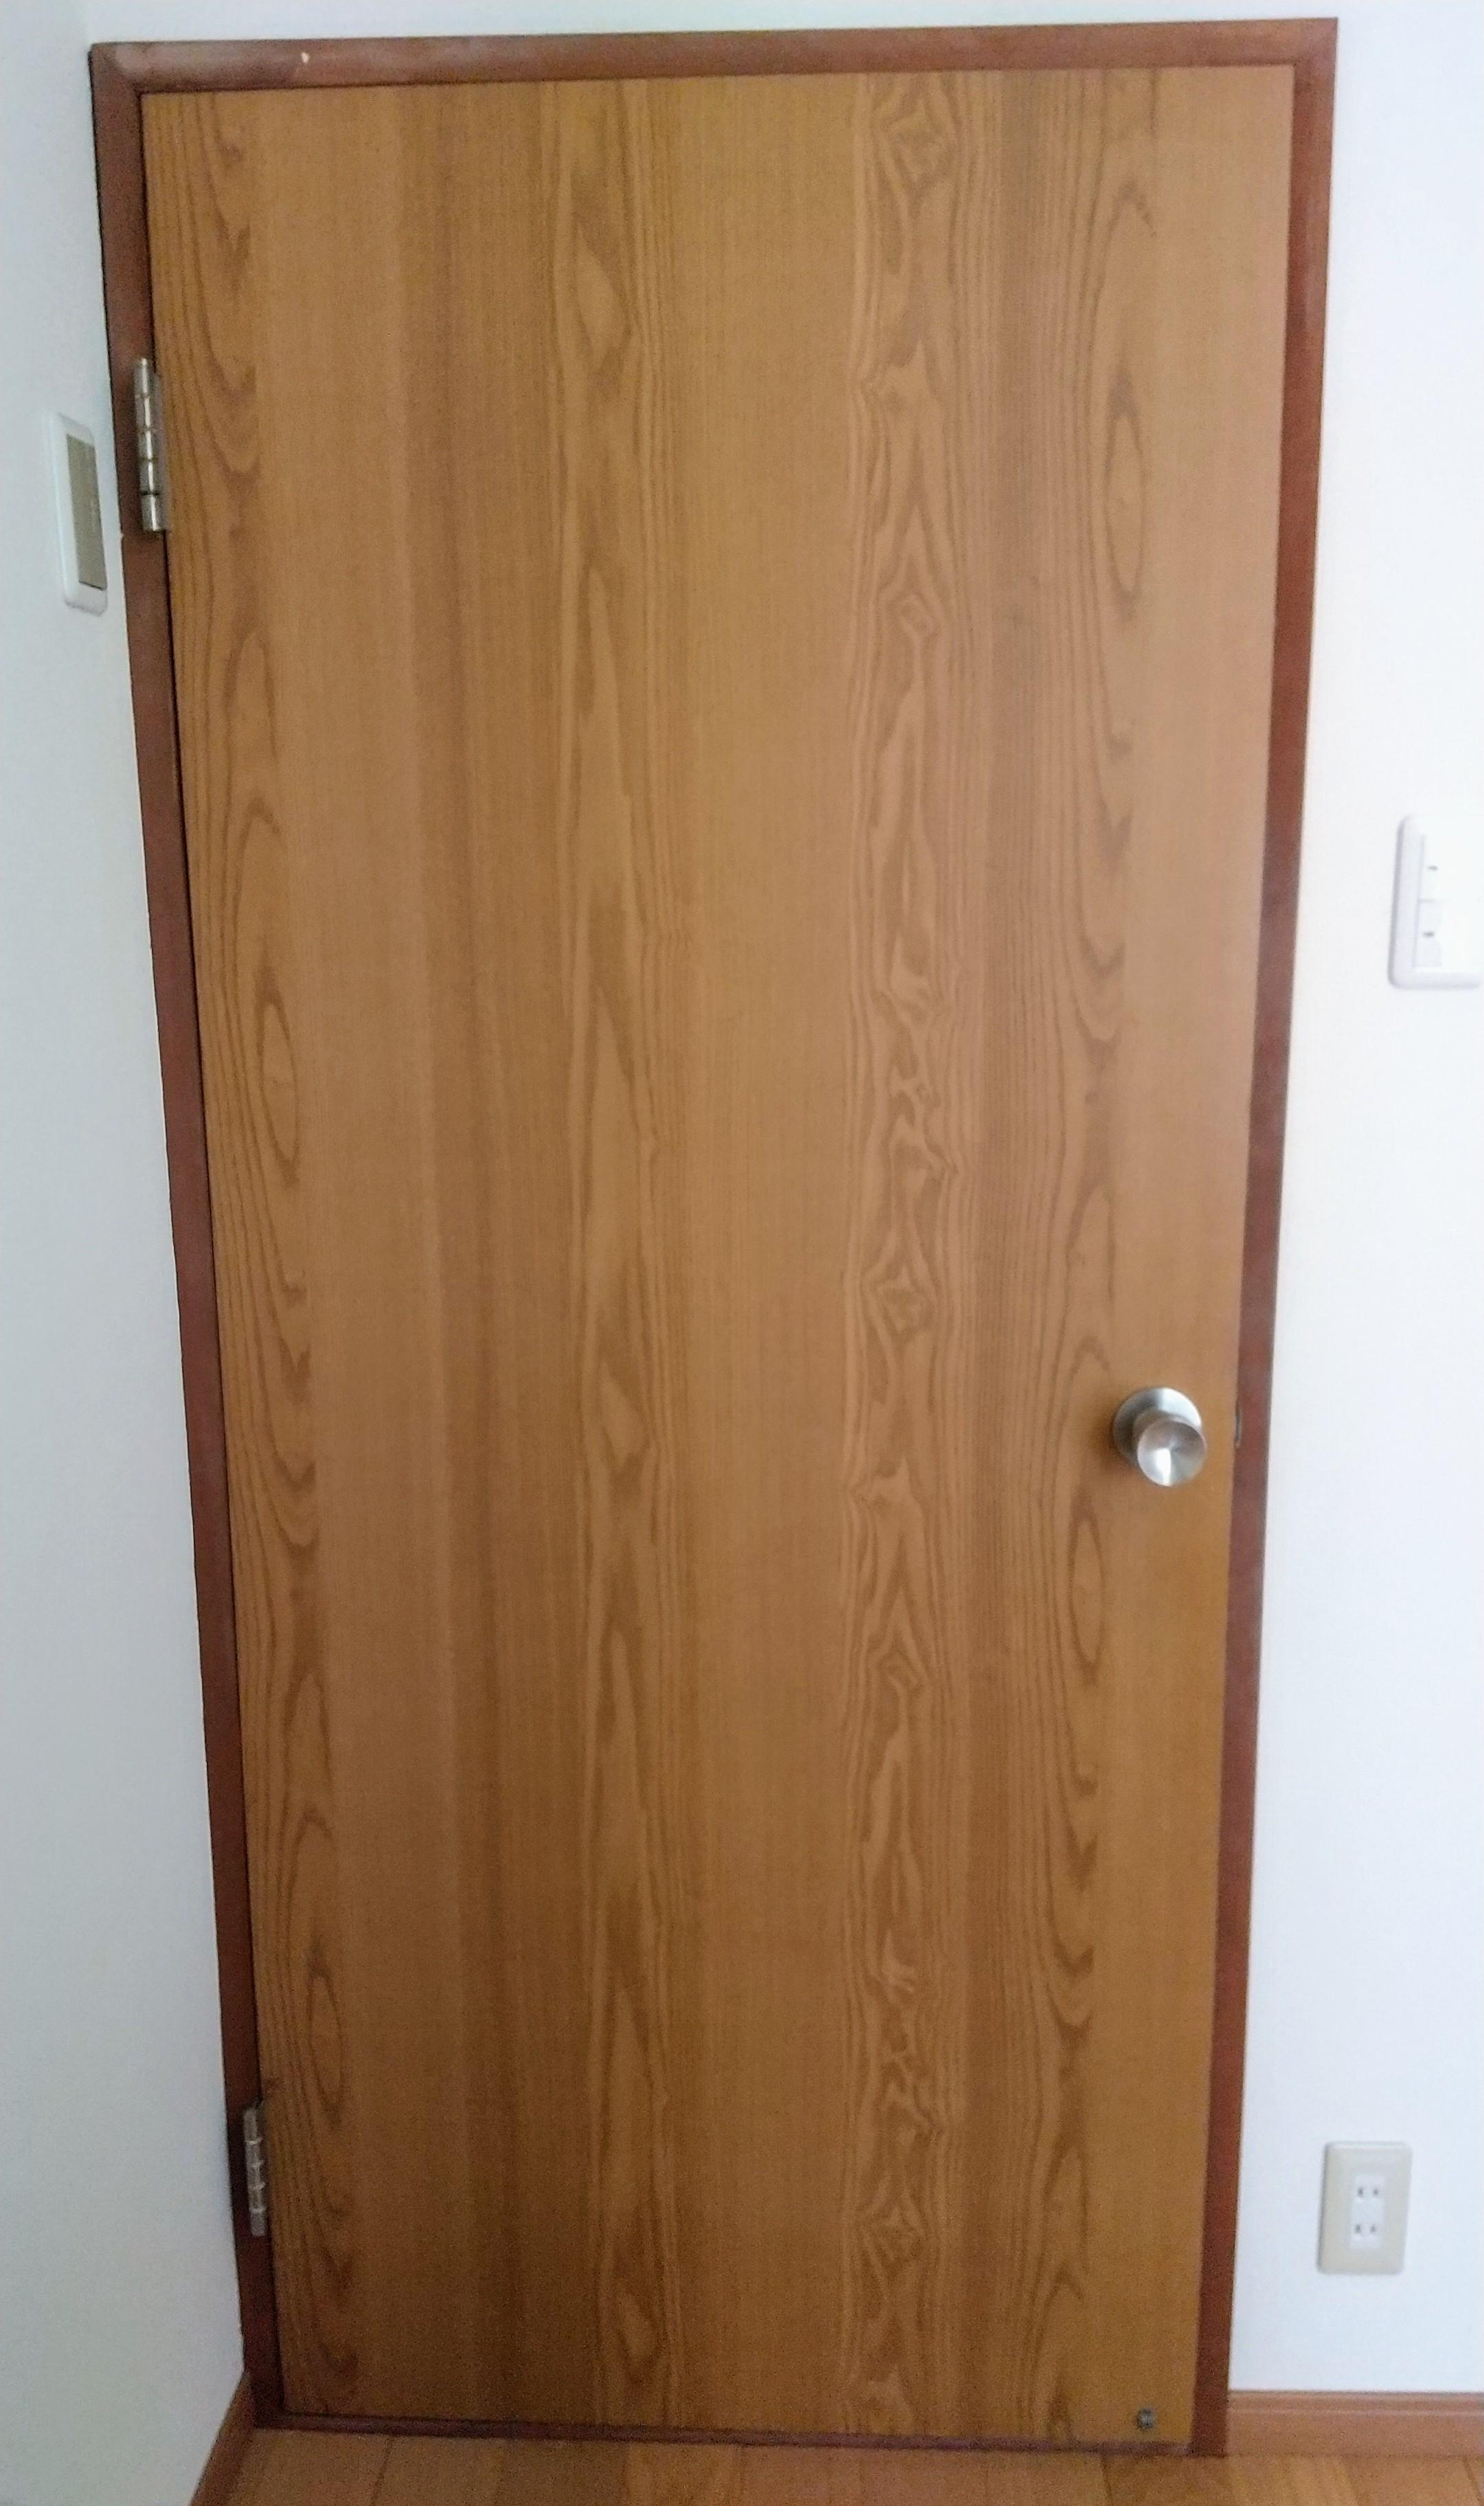 Diy 古いドアノブを外して古いドアに白い壁紙貼り 貧乏父さんの節約術 節約テクニック大公開